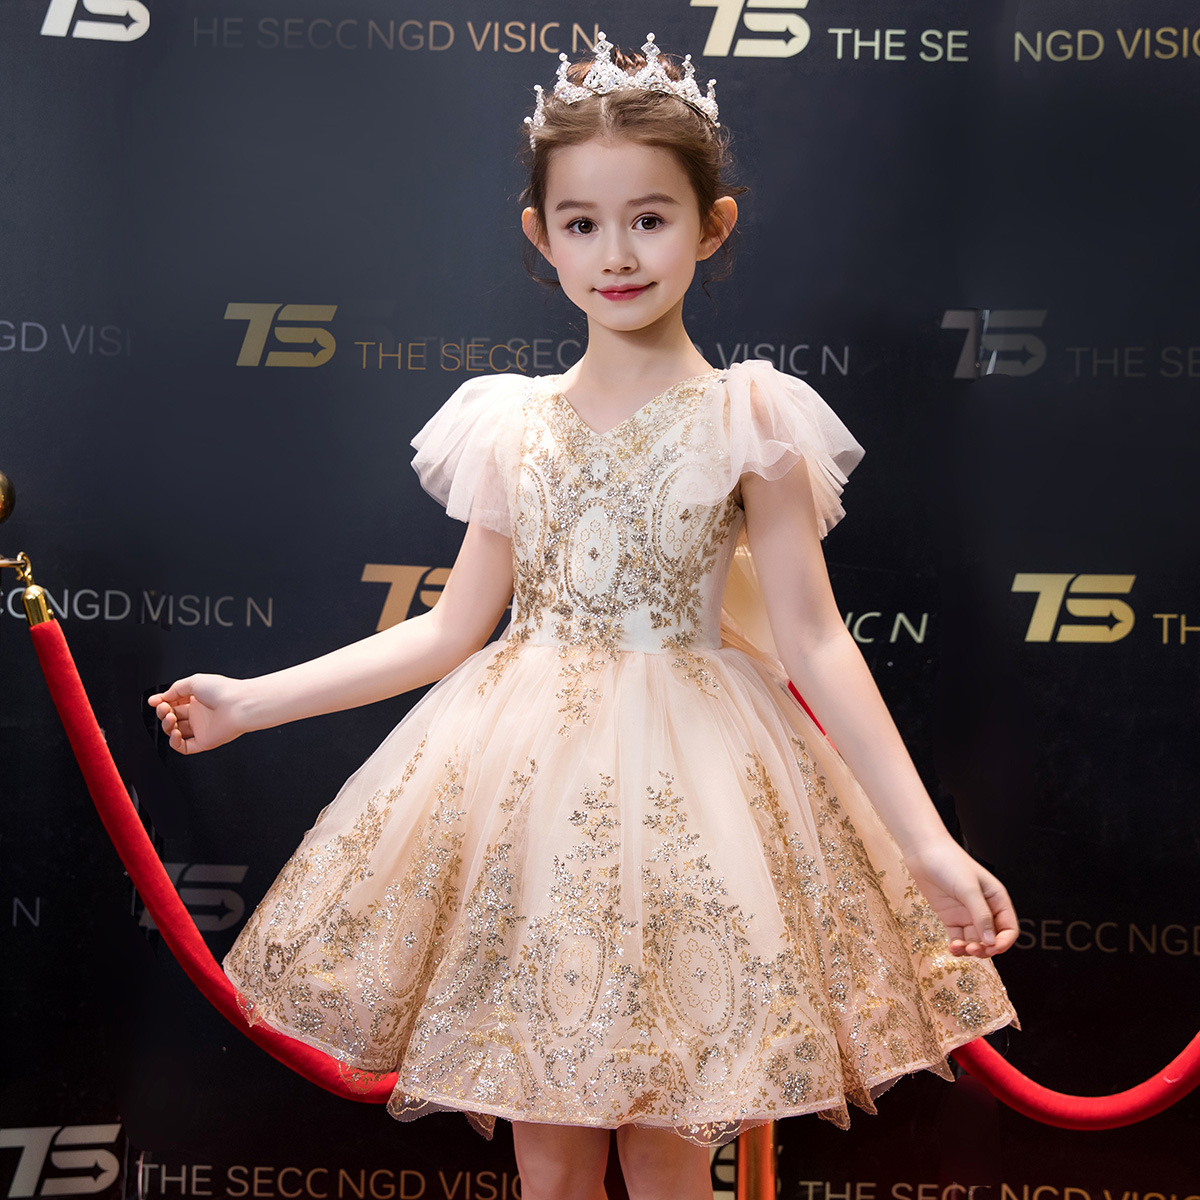 Gold Bling Sequined Flower Girl Dresses for Wedding Evening Gowns Flare Sleeve V neck Kids Pageant